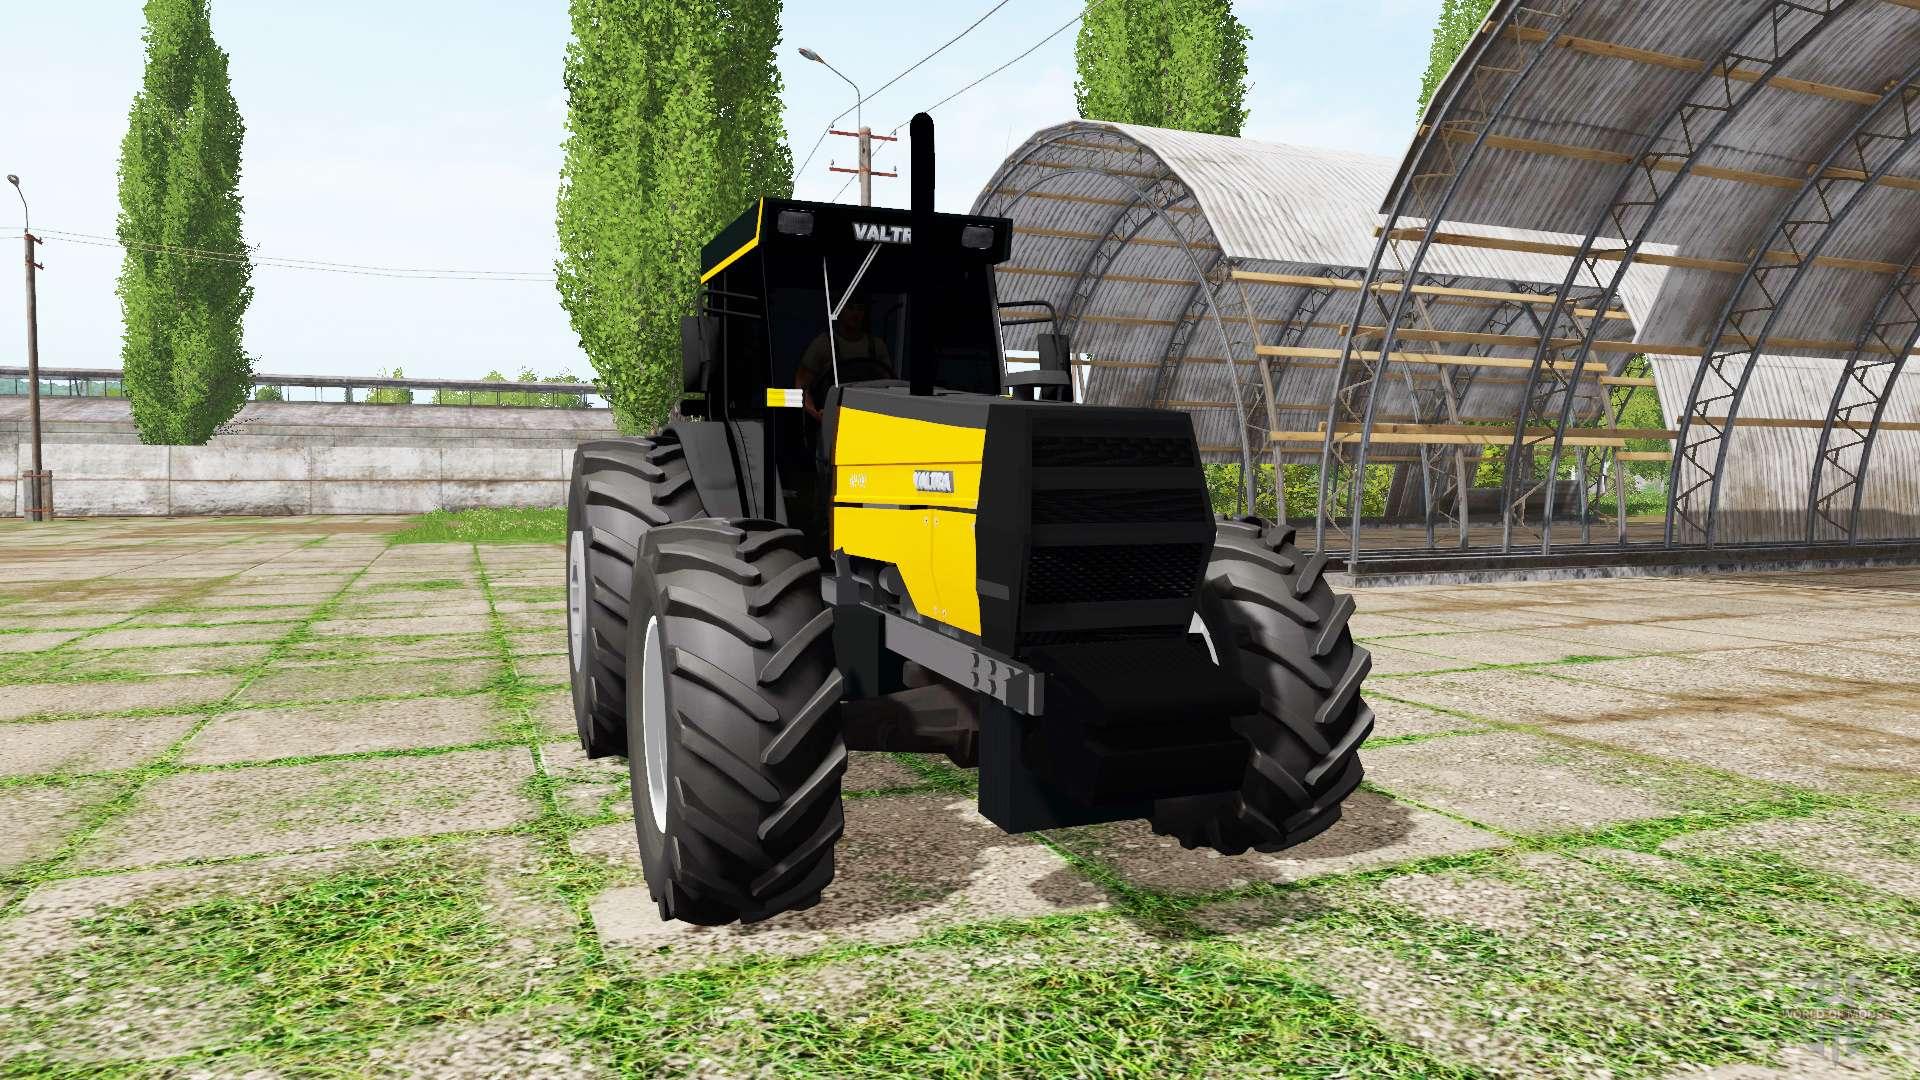 Конструкция трактора мтз | Трактор МТЗ-80 Беларус.